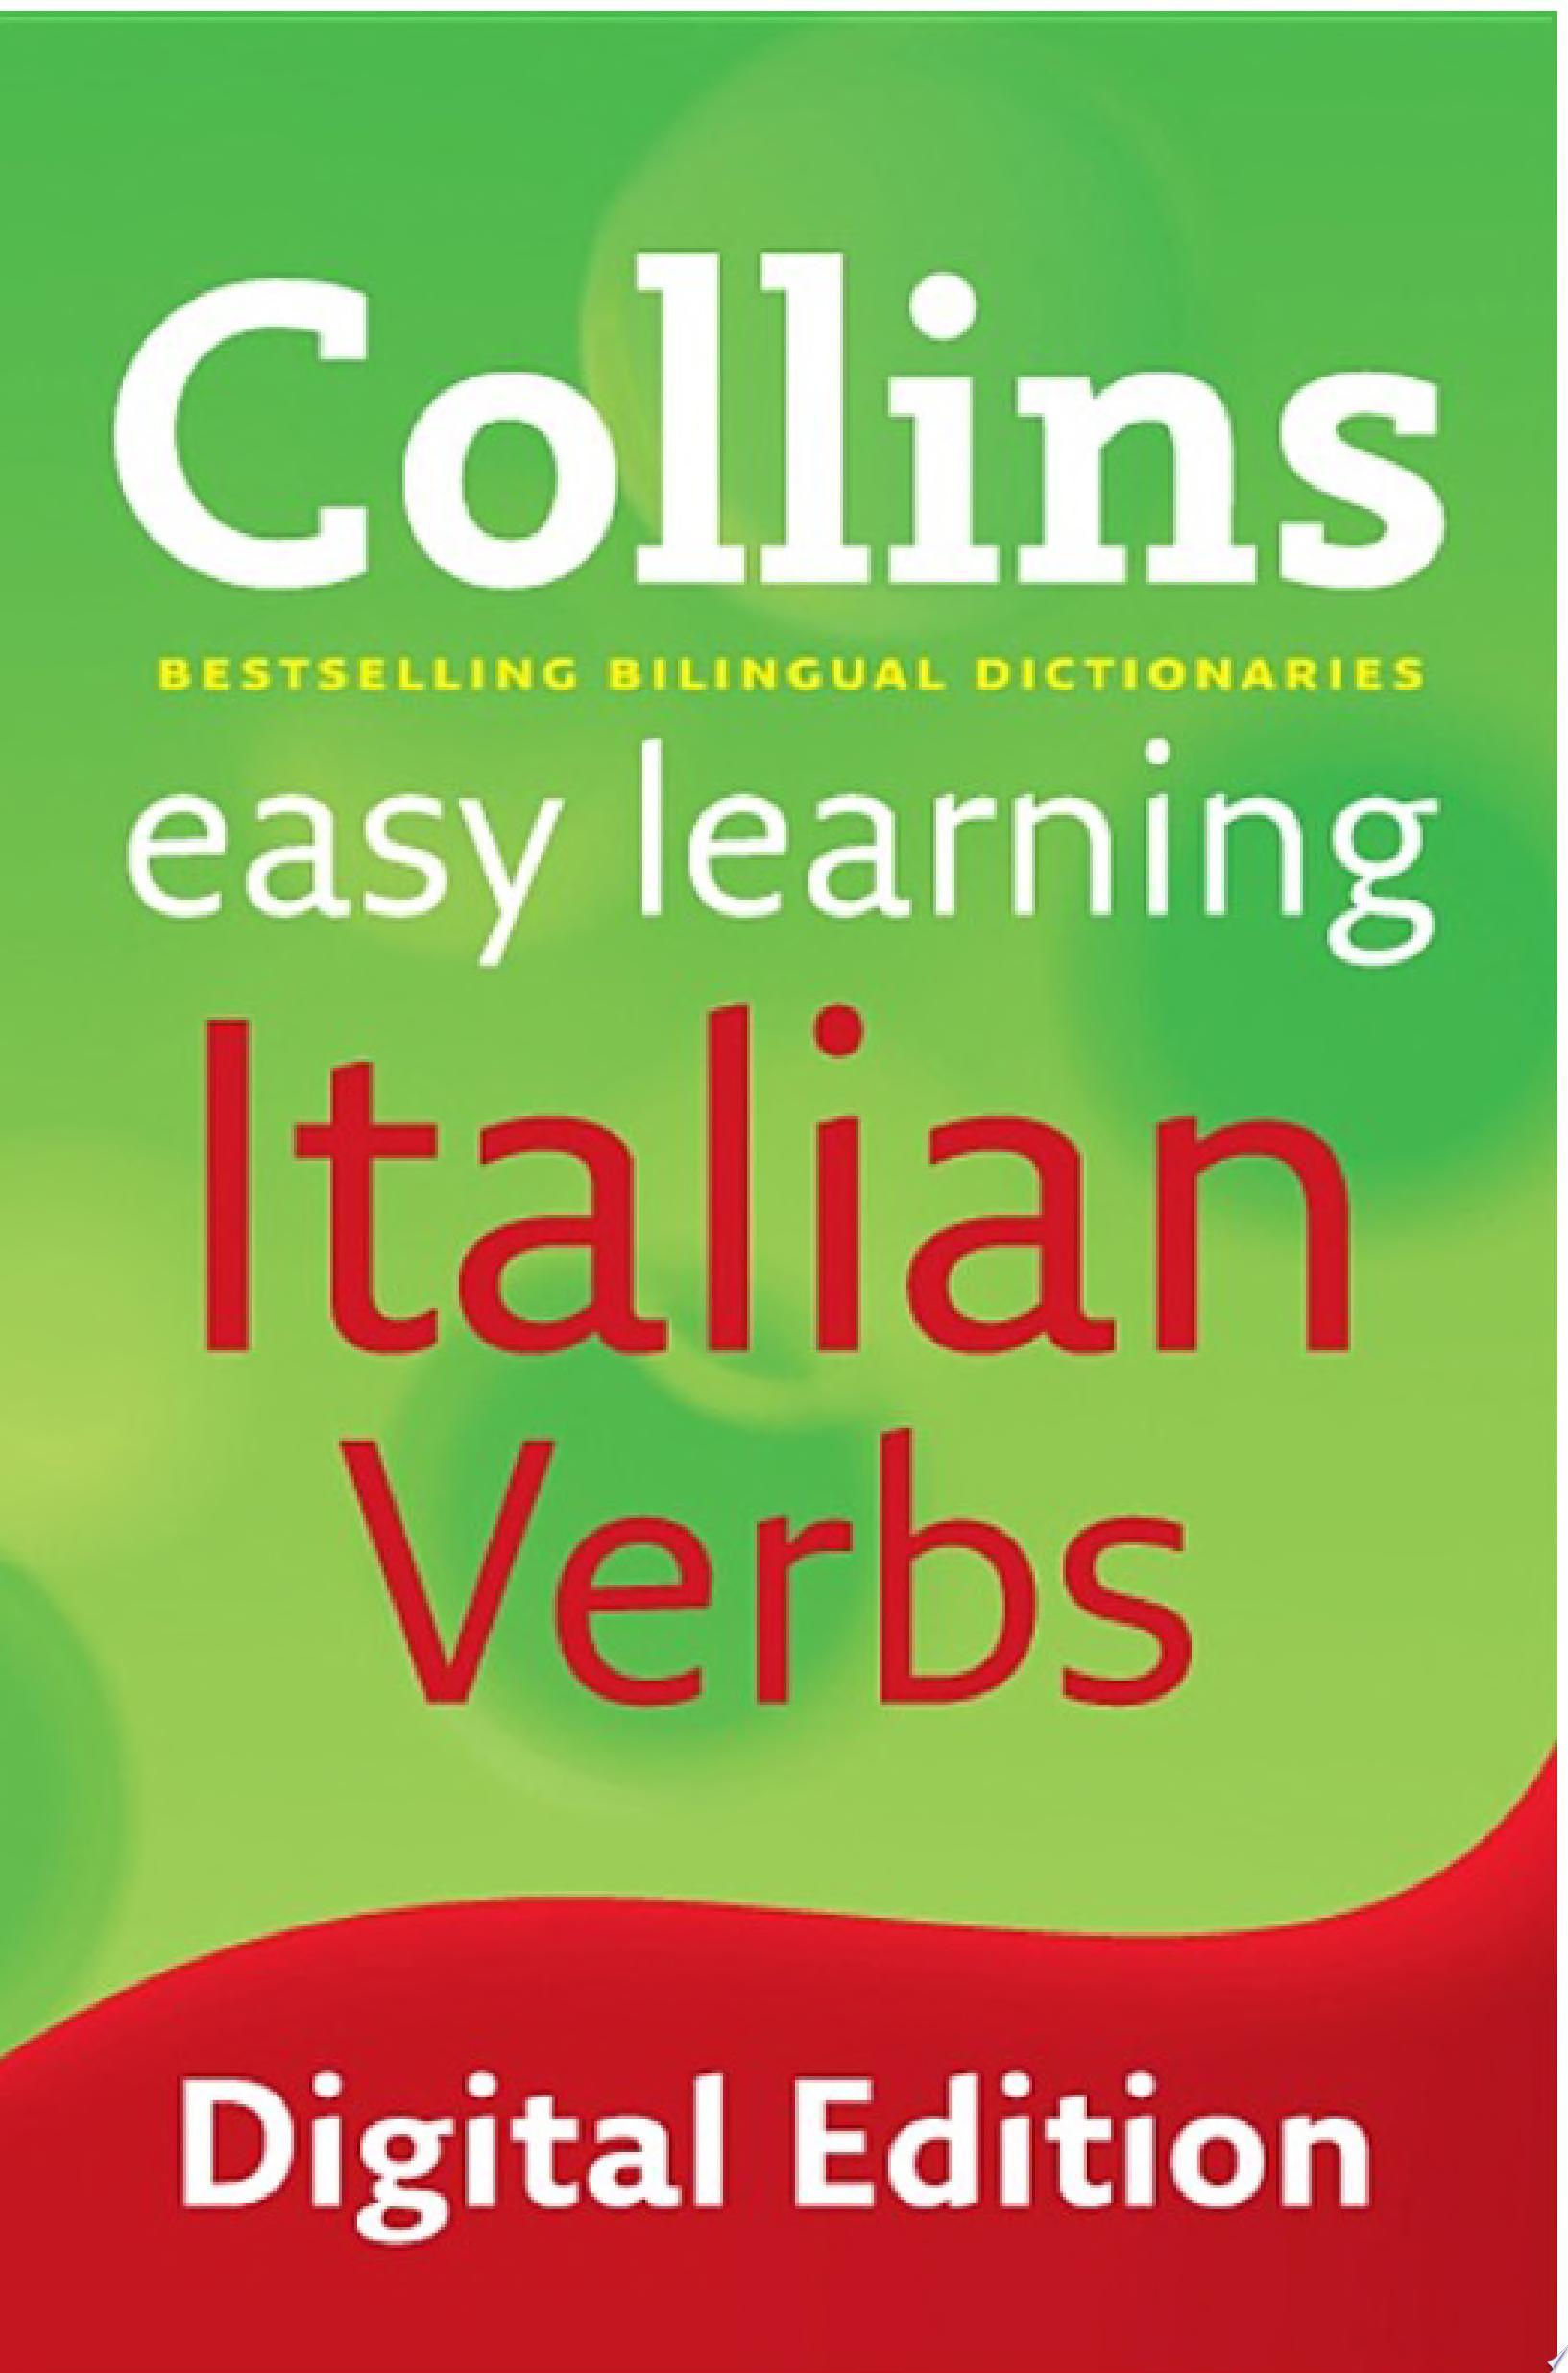 Easy Learning Italian Verbs  Collins Easy Learning Italian